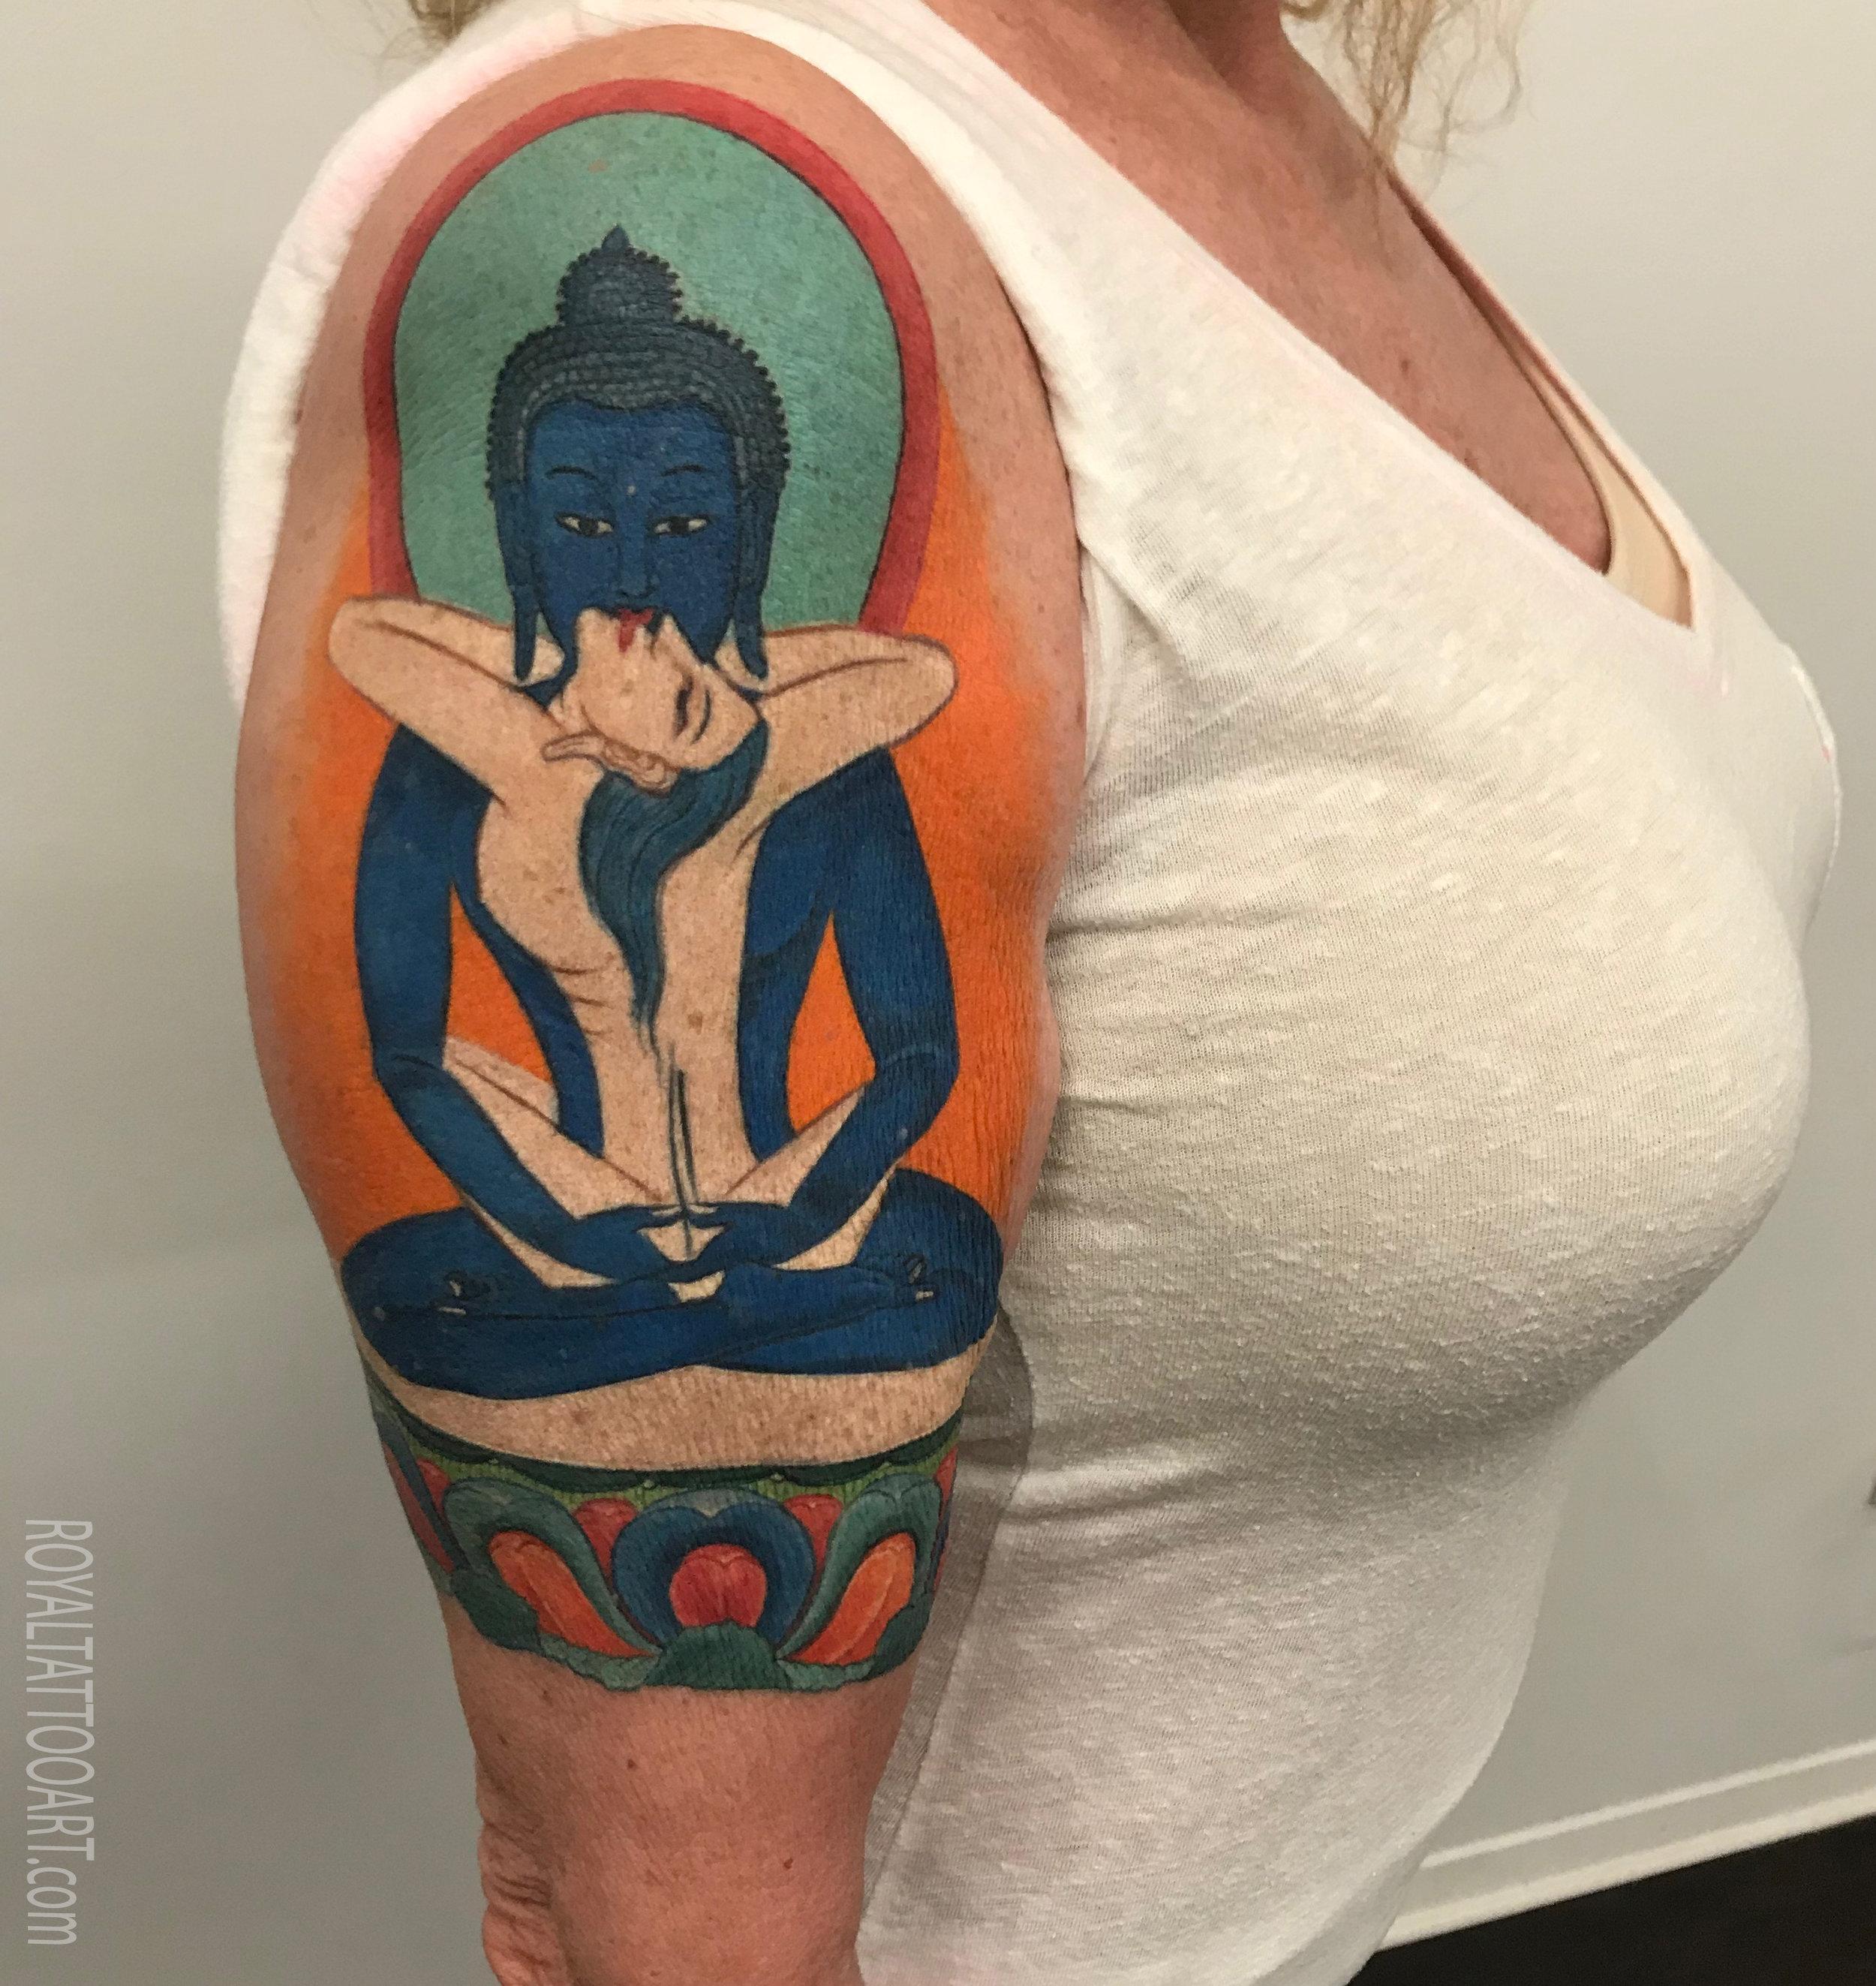 healed tattoo art budism erotic copy.jpg